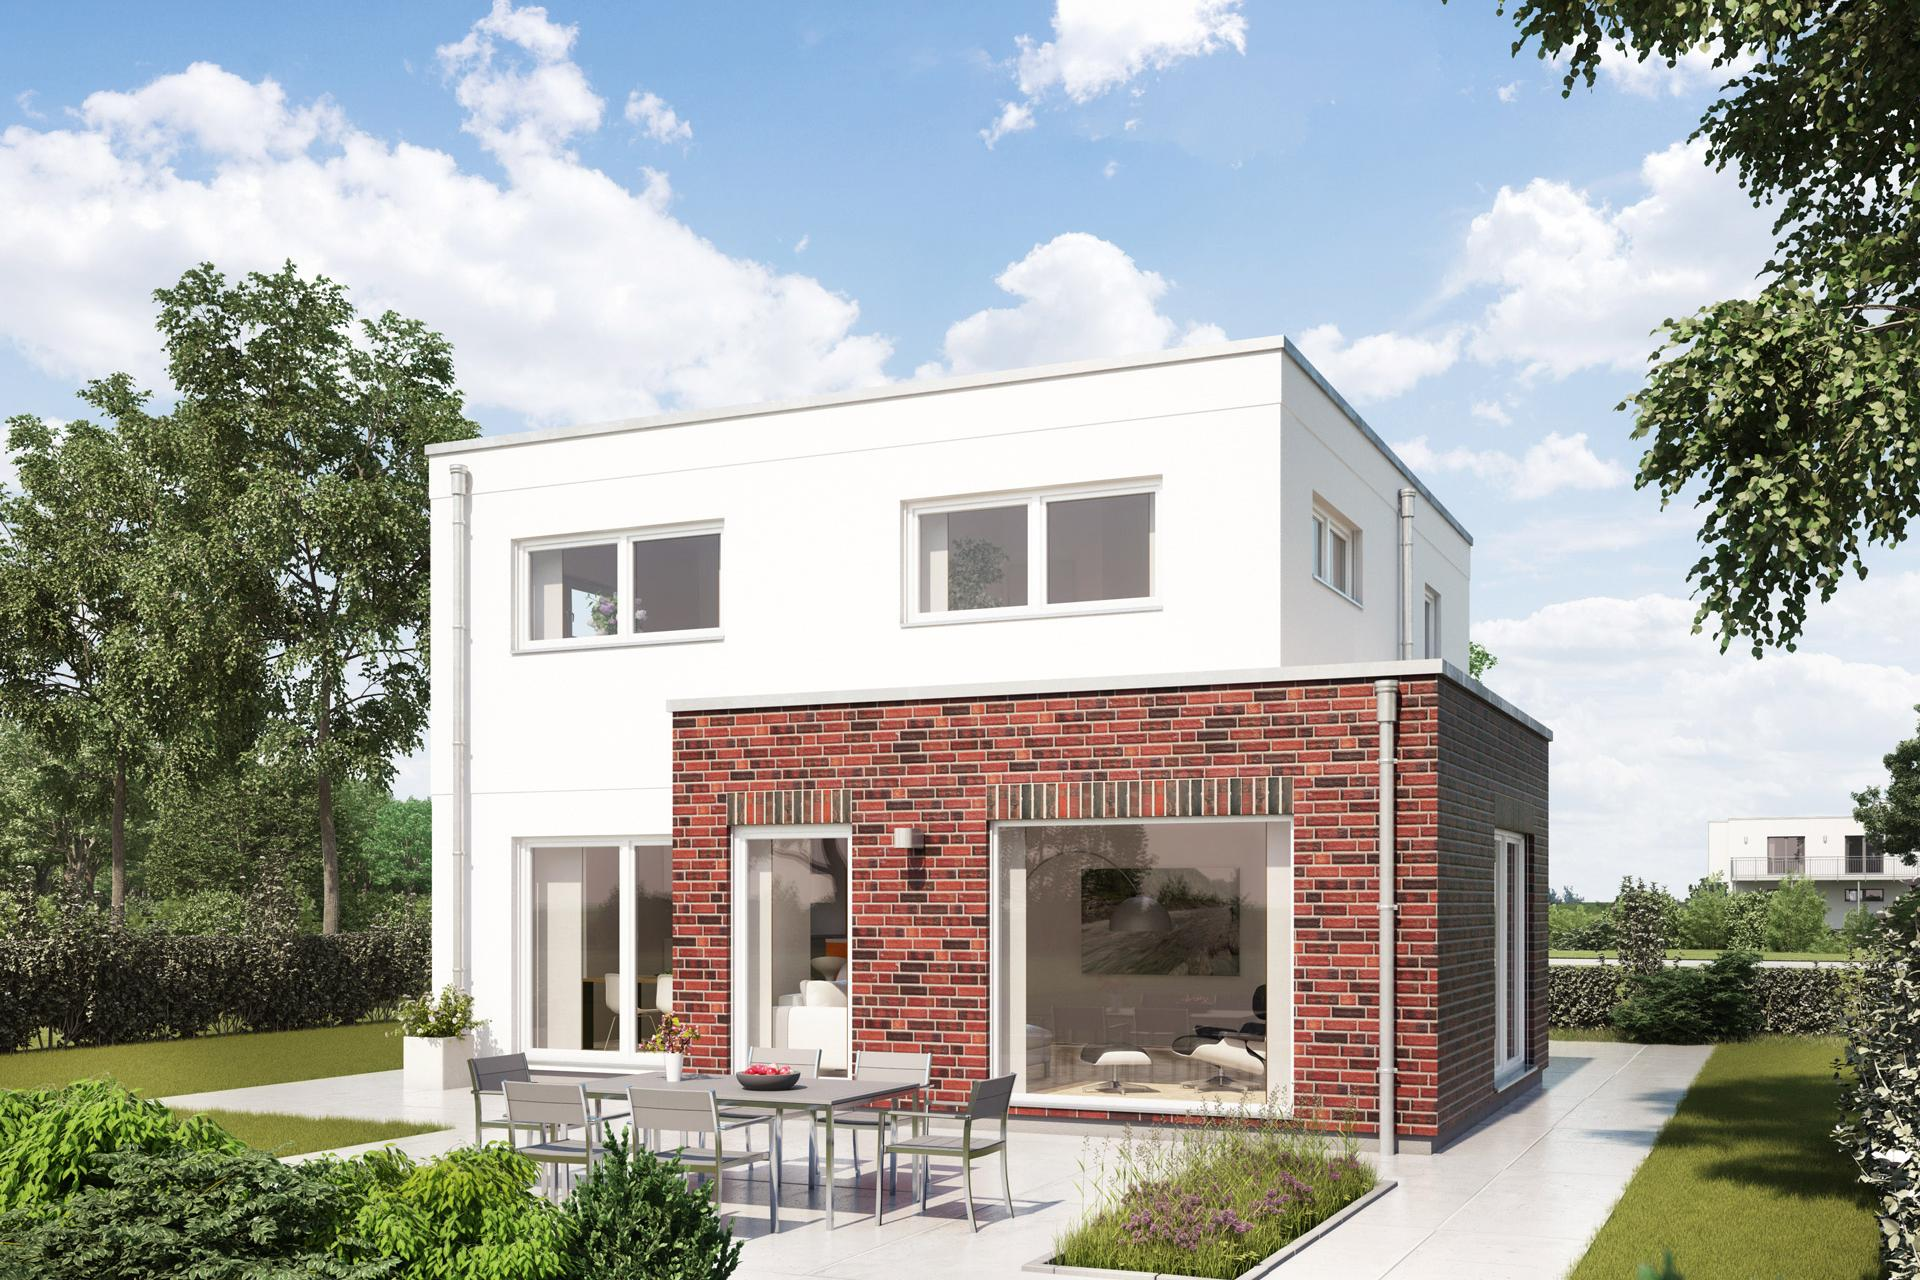 fertighaus im bauhausstil schw rerhaus. Black Bedroom Furniture Sets. Home Design Ideas